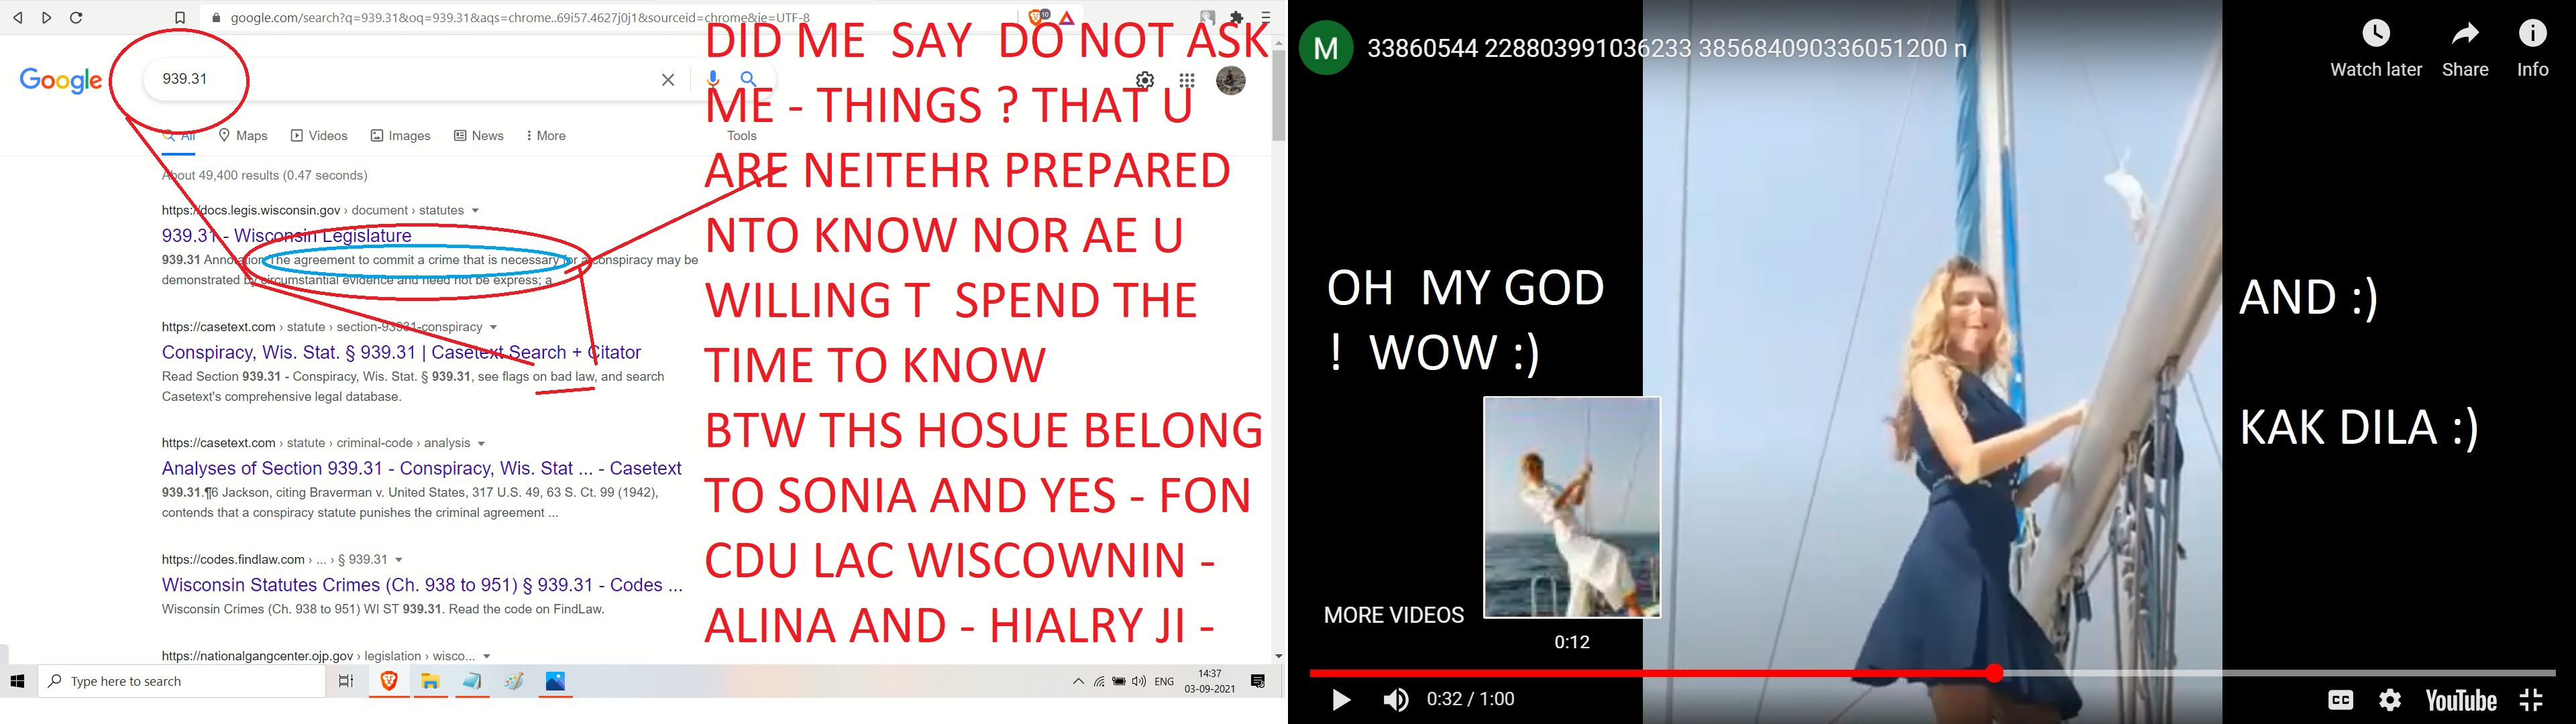 AJAY MISHRA ALINA MATSENKO SONIA AND HIALRY CLINTON ITEM SONG - WHERE IS FON DU LAC WINSCOSN HIALRY JI ===---